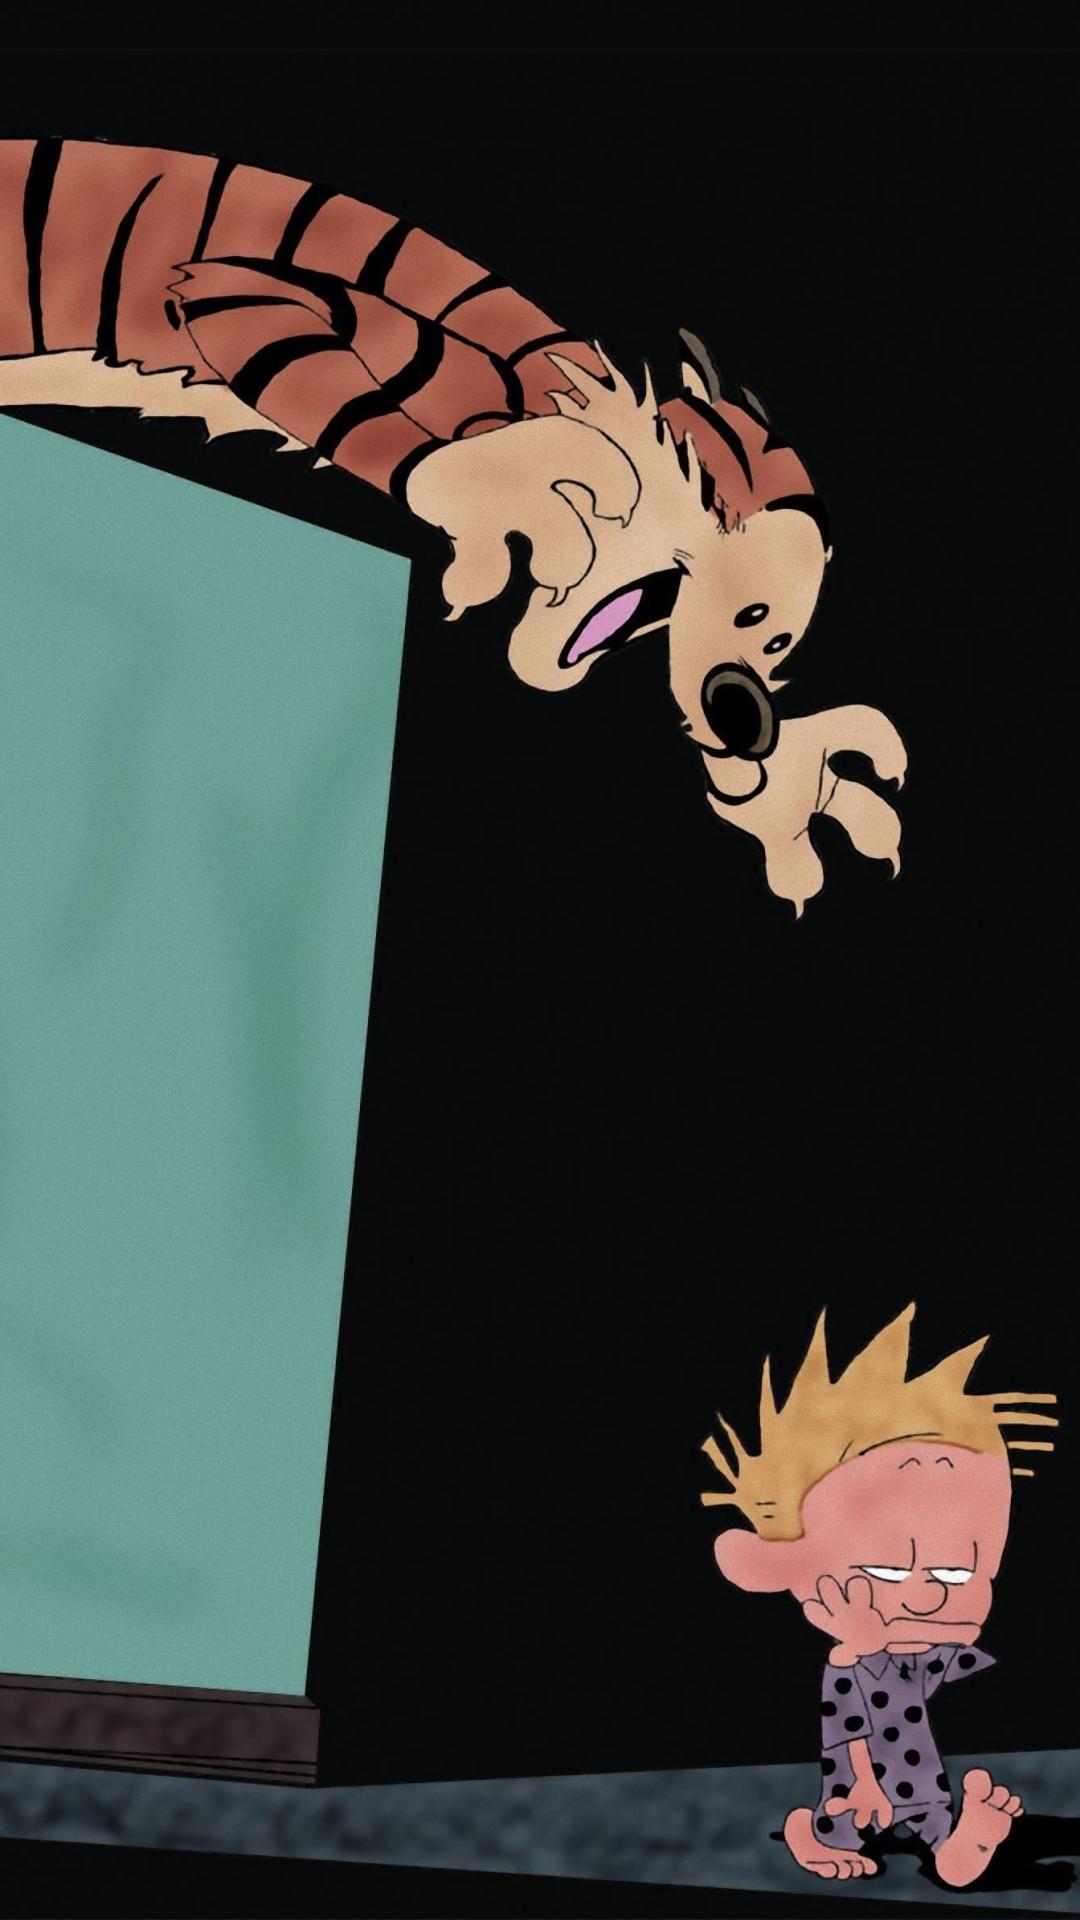 Comics Calvin Hobbes 1080x1920 Mobile Wallpaper